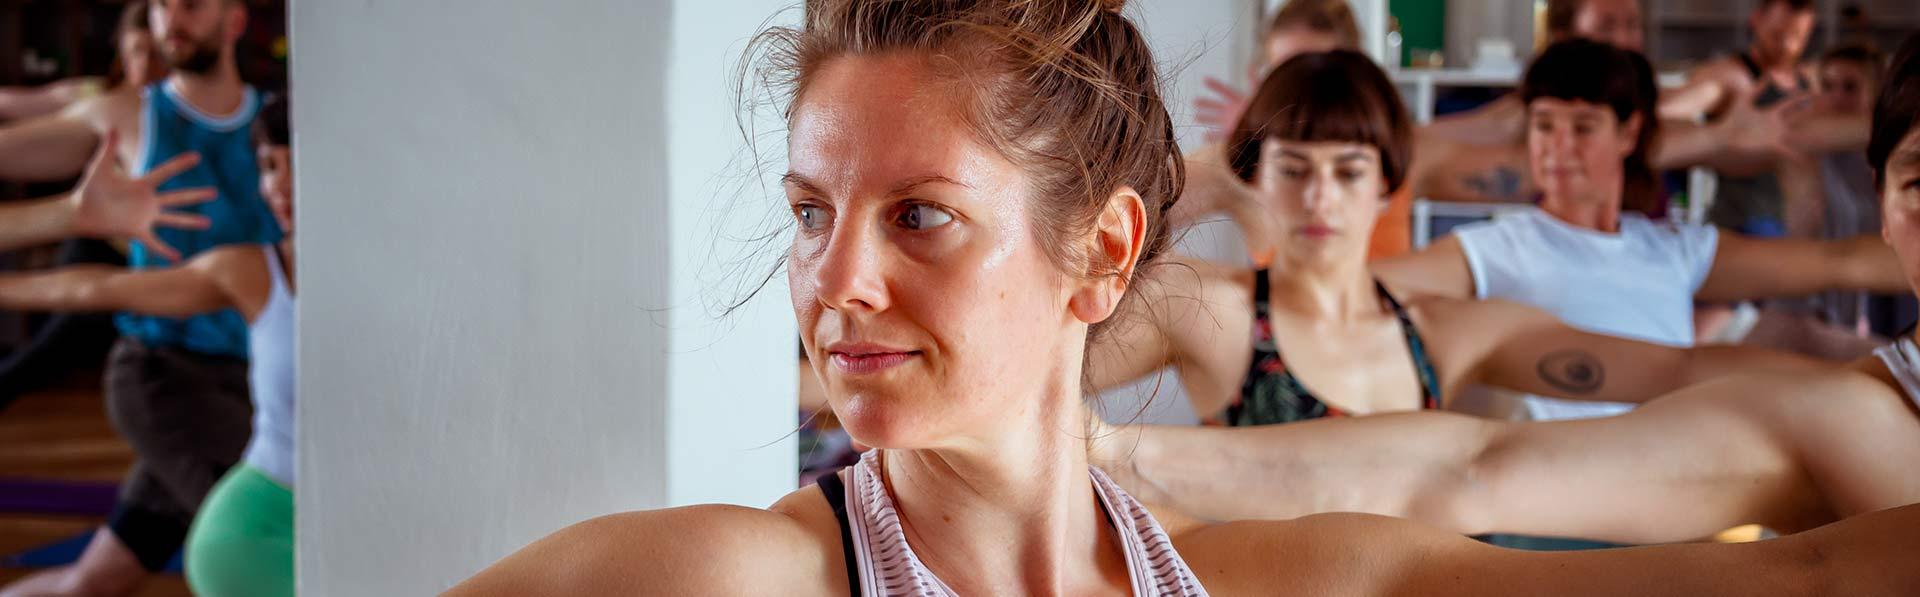 yogafürdich 300+Std. Aufbau-Ausbildung in Berlin